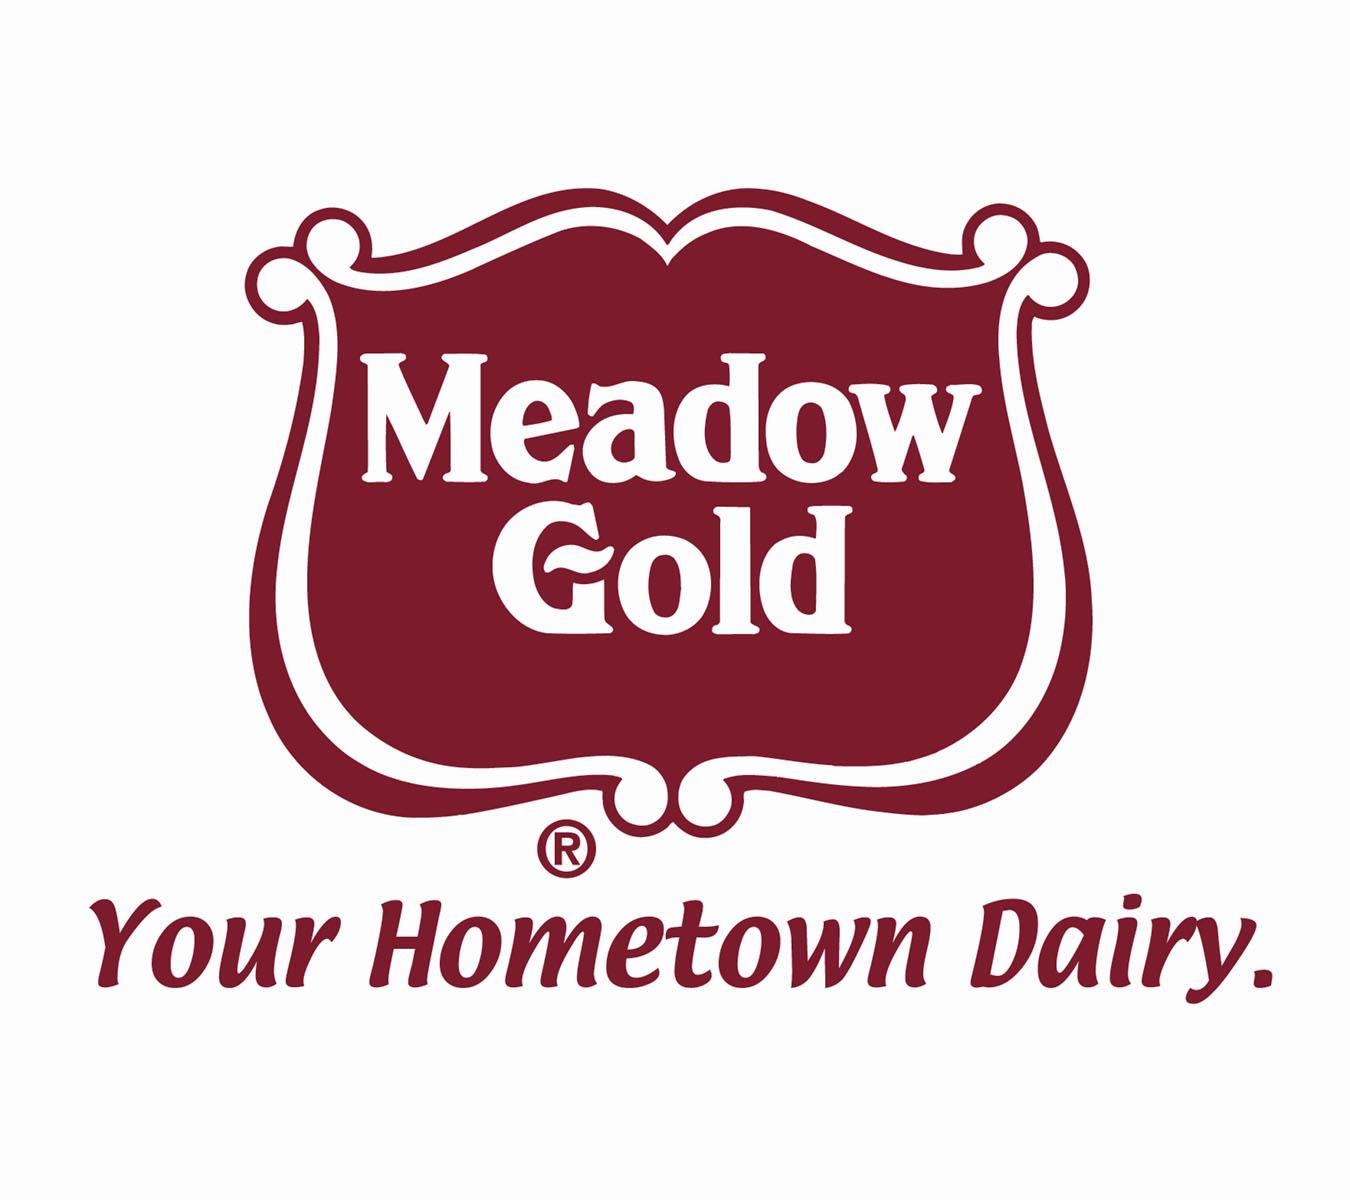 Meadow Gold Dairies, Inc.